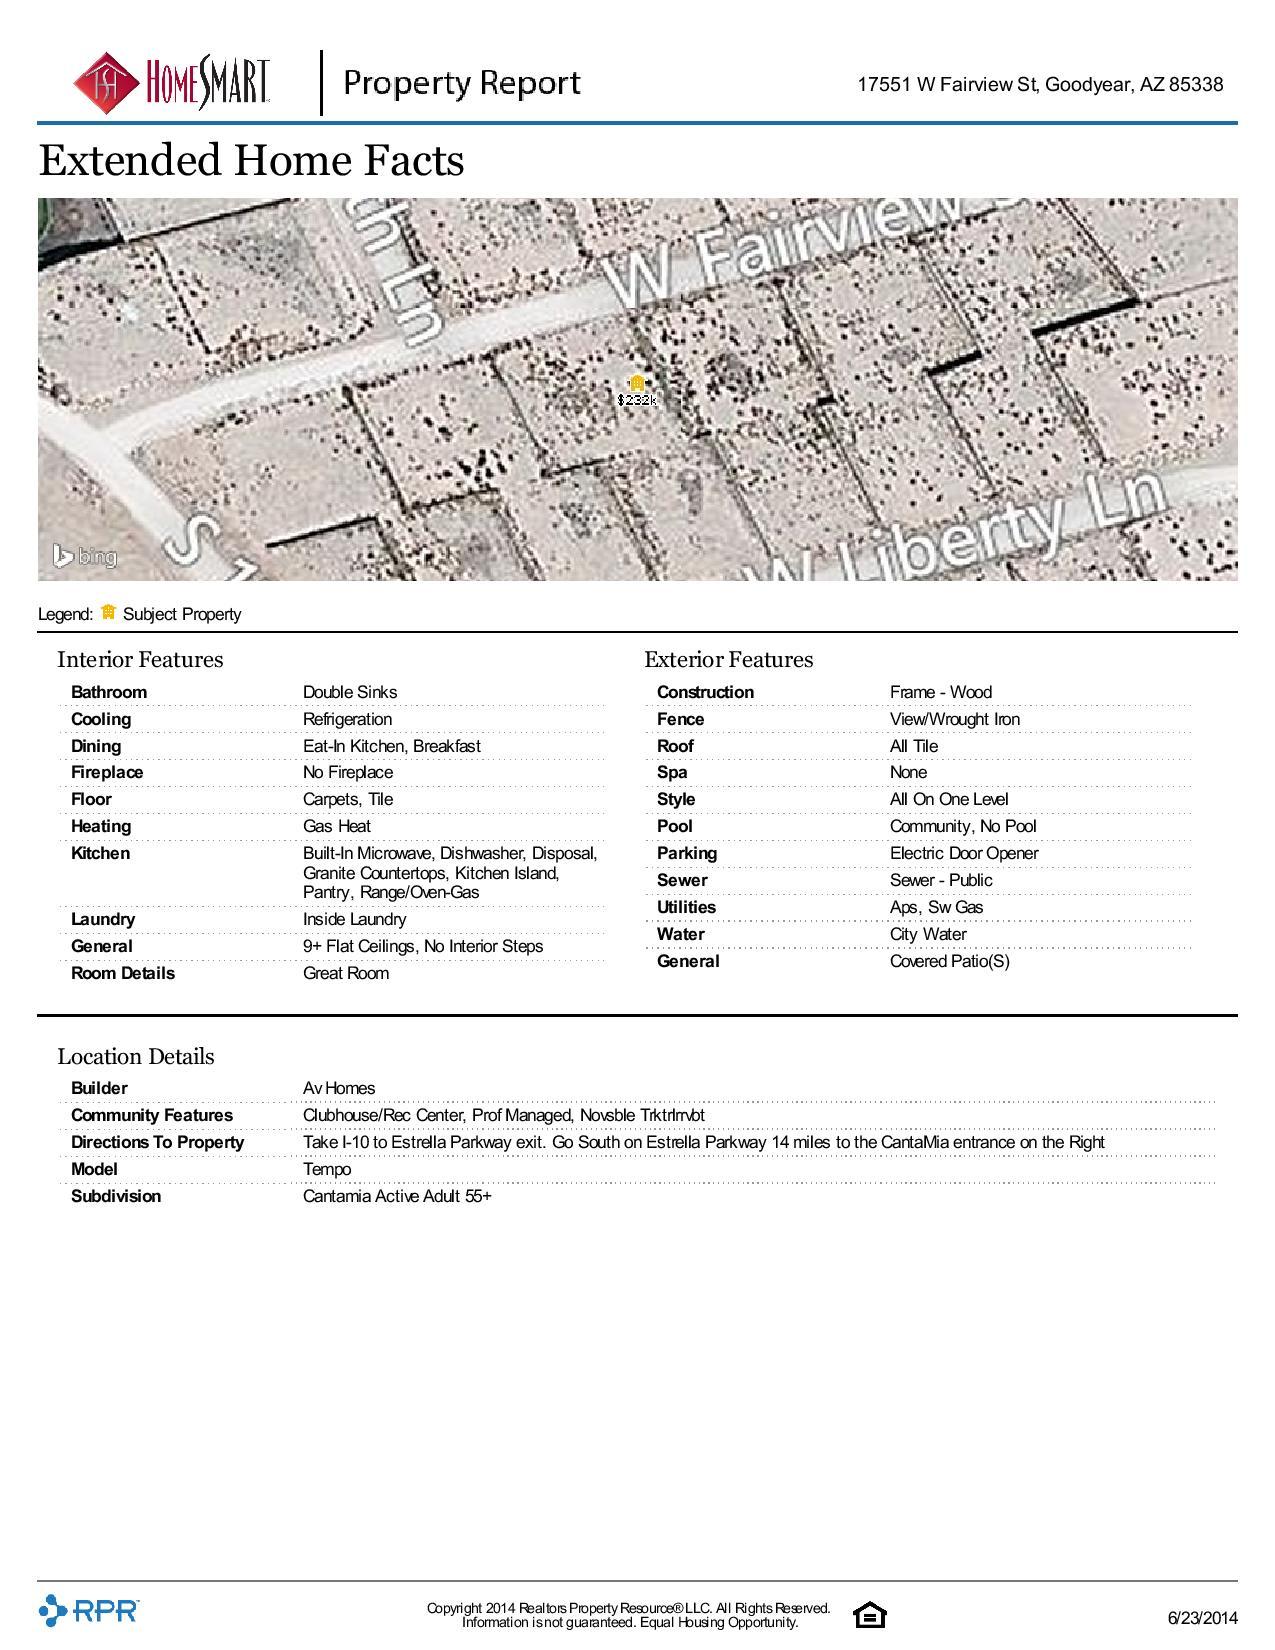 17551-W-Fairview-St-Goodyear-AZ-85338-page-004